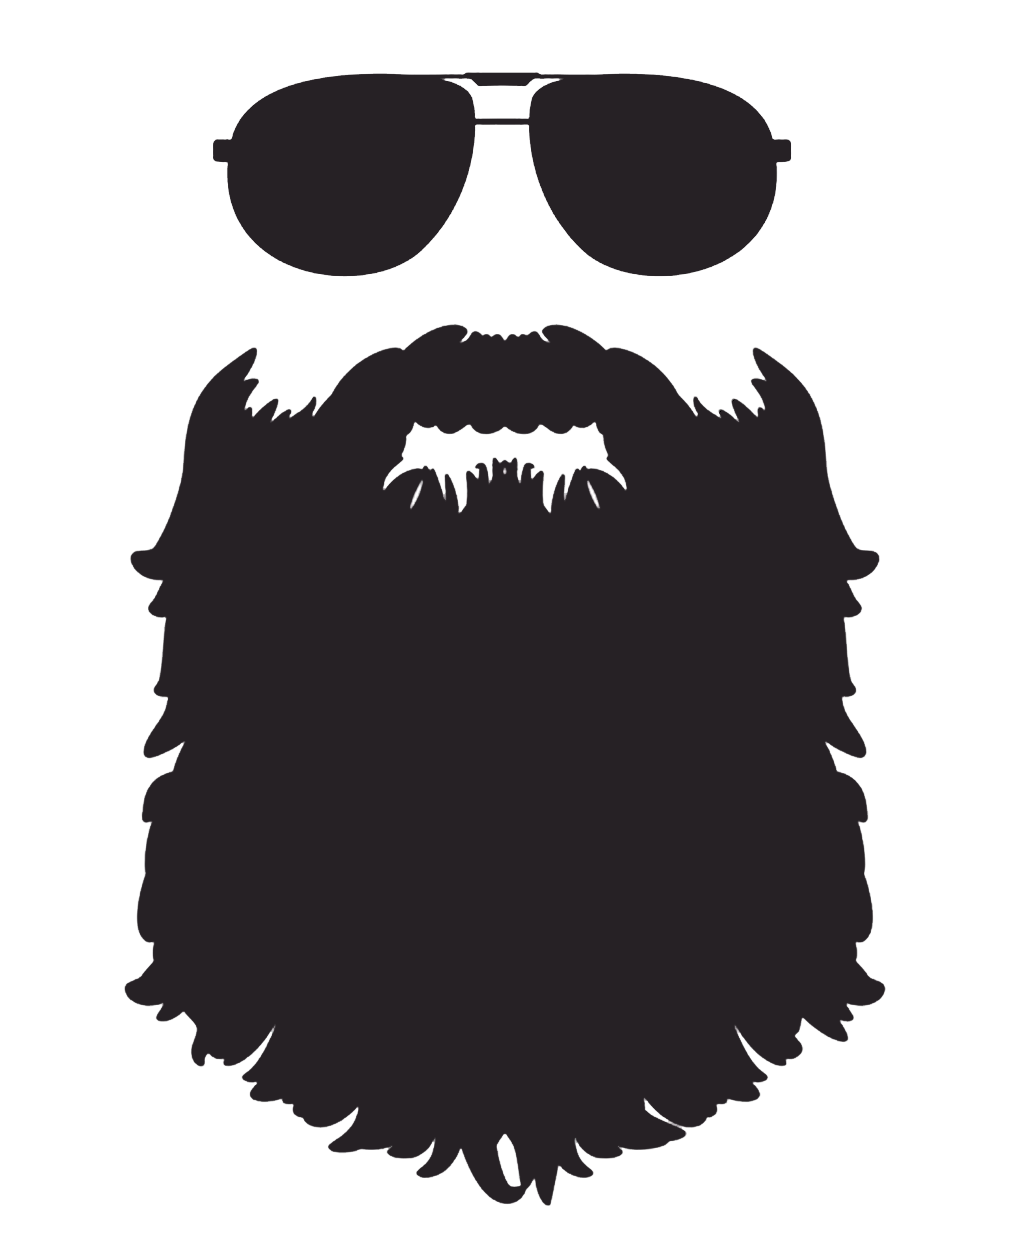 Silhouette Beard Free Clipart Hq Beard Silhouette Beard Stickers Beard Art